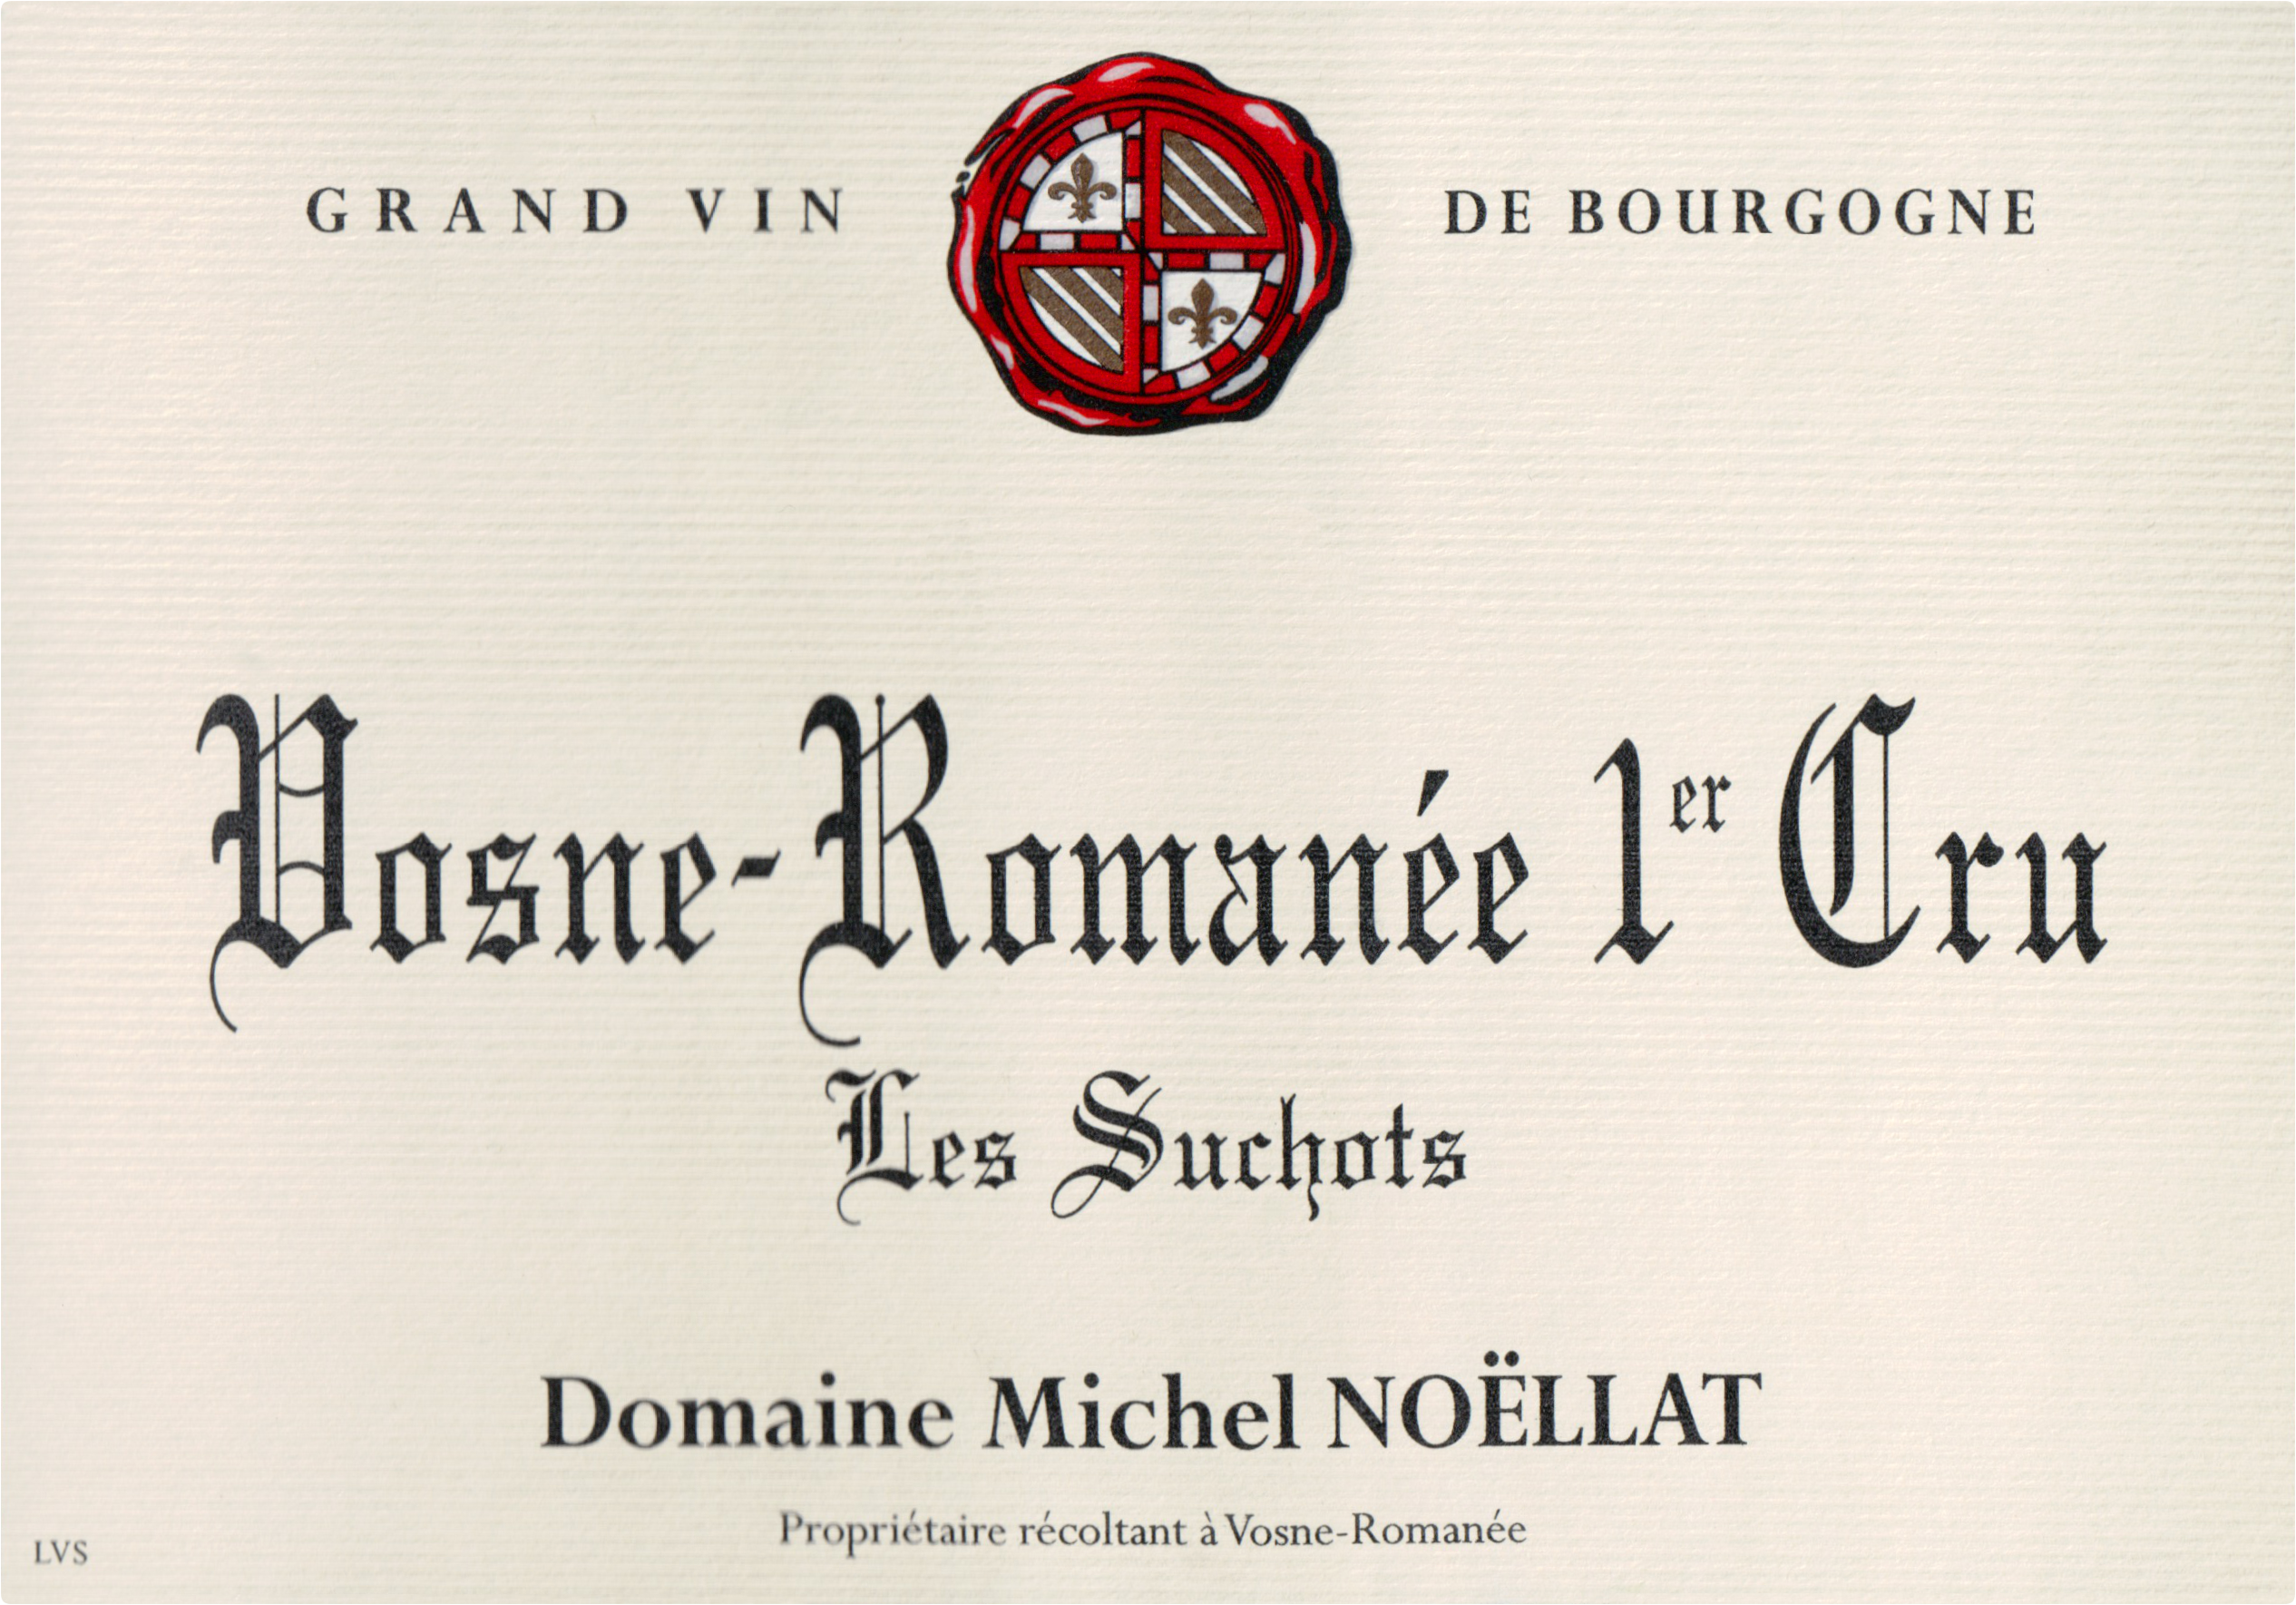 Michel Noellat Vosne Romanee Les Suchots 1er Cru 2016